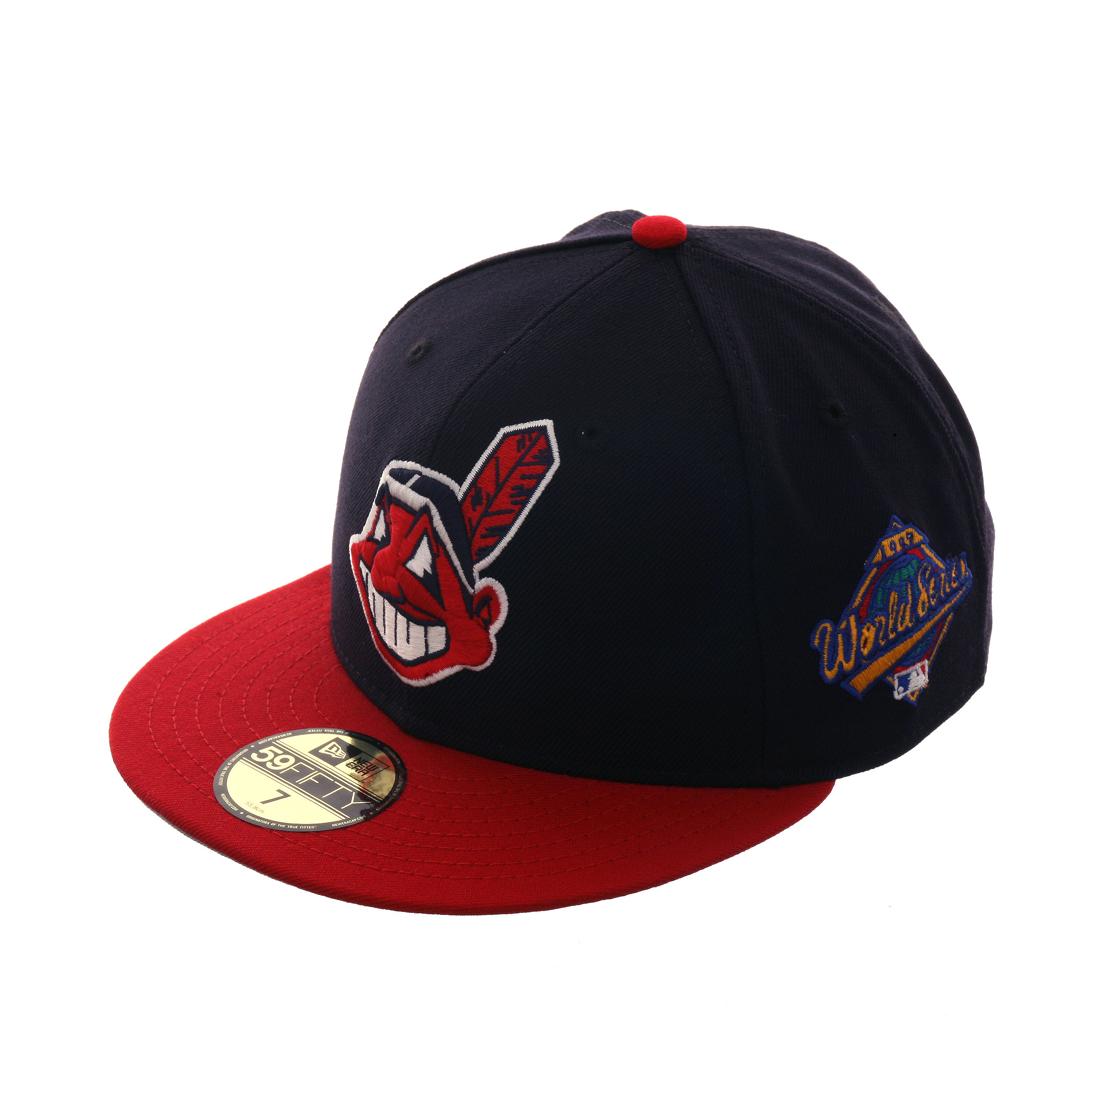 New Era 59fifty Cleveland Indians 1997 World Series Fitted Hat 2t Navy Red 40 00 Fitted Hats New Era 59fifty Cleveland Indians